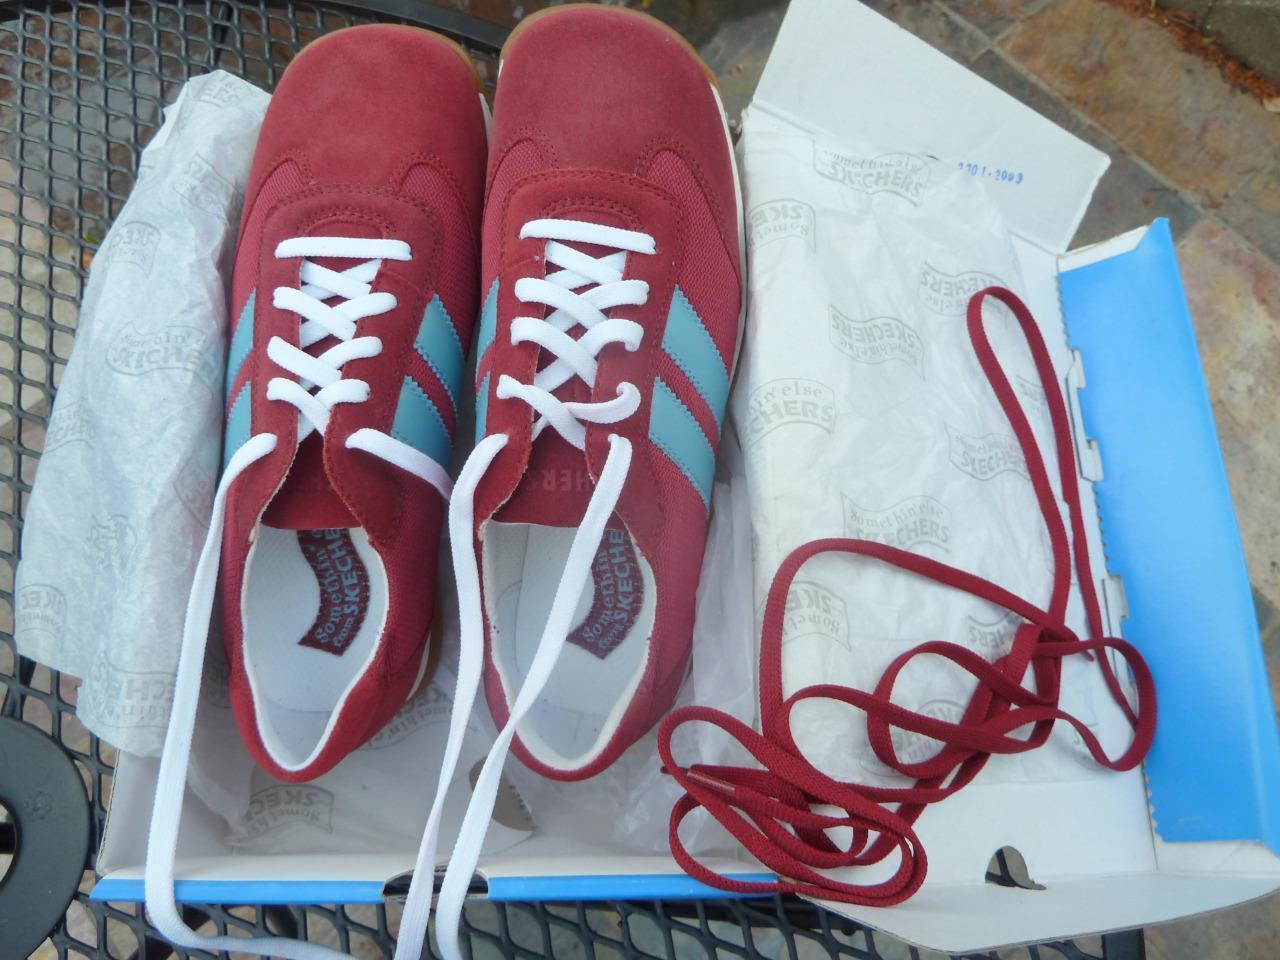 NIB Womens 8M Skechers Something Else Grand Prix Wine Red Light bluee Suede shoes